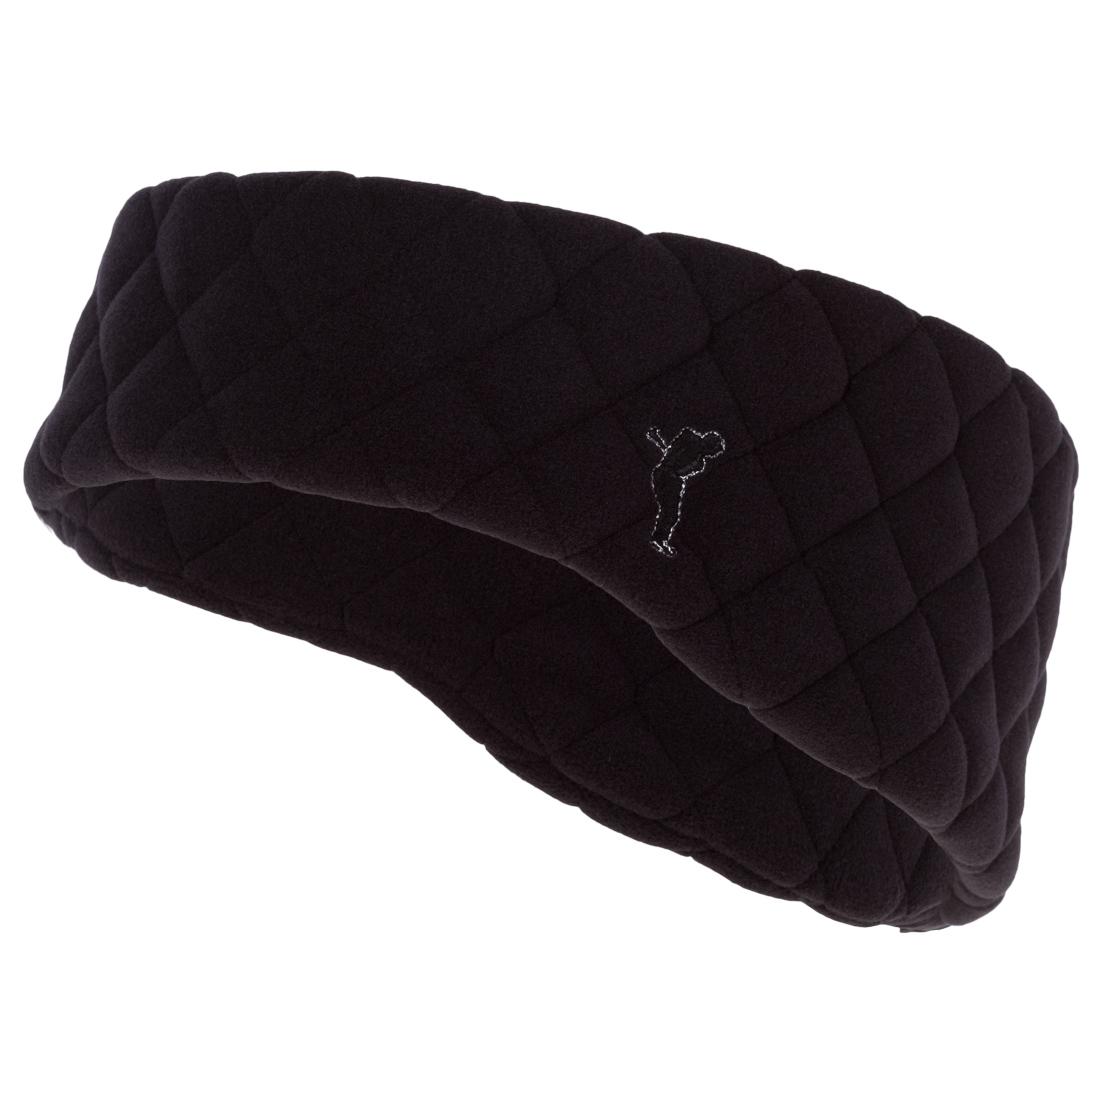 GOLFINO Ladies  polar fleece headband with ear muffs shop online ... 78f8e3ef8a1